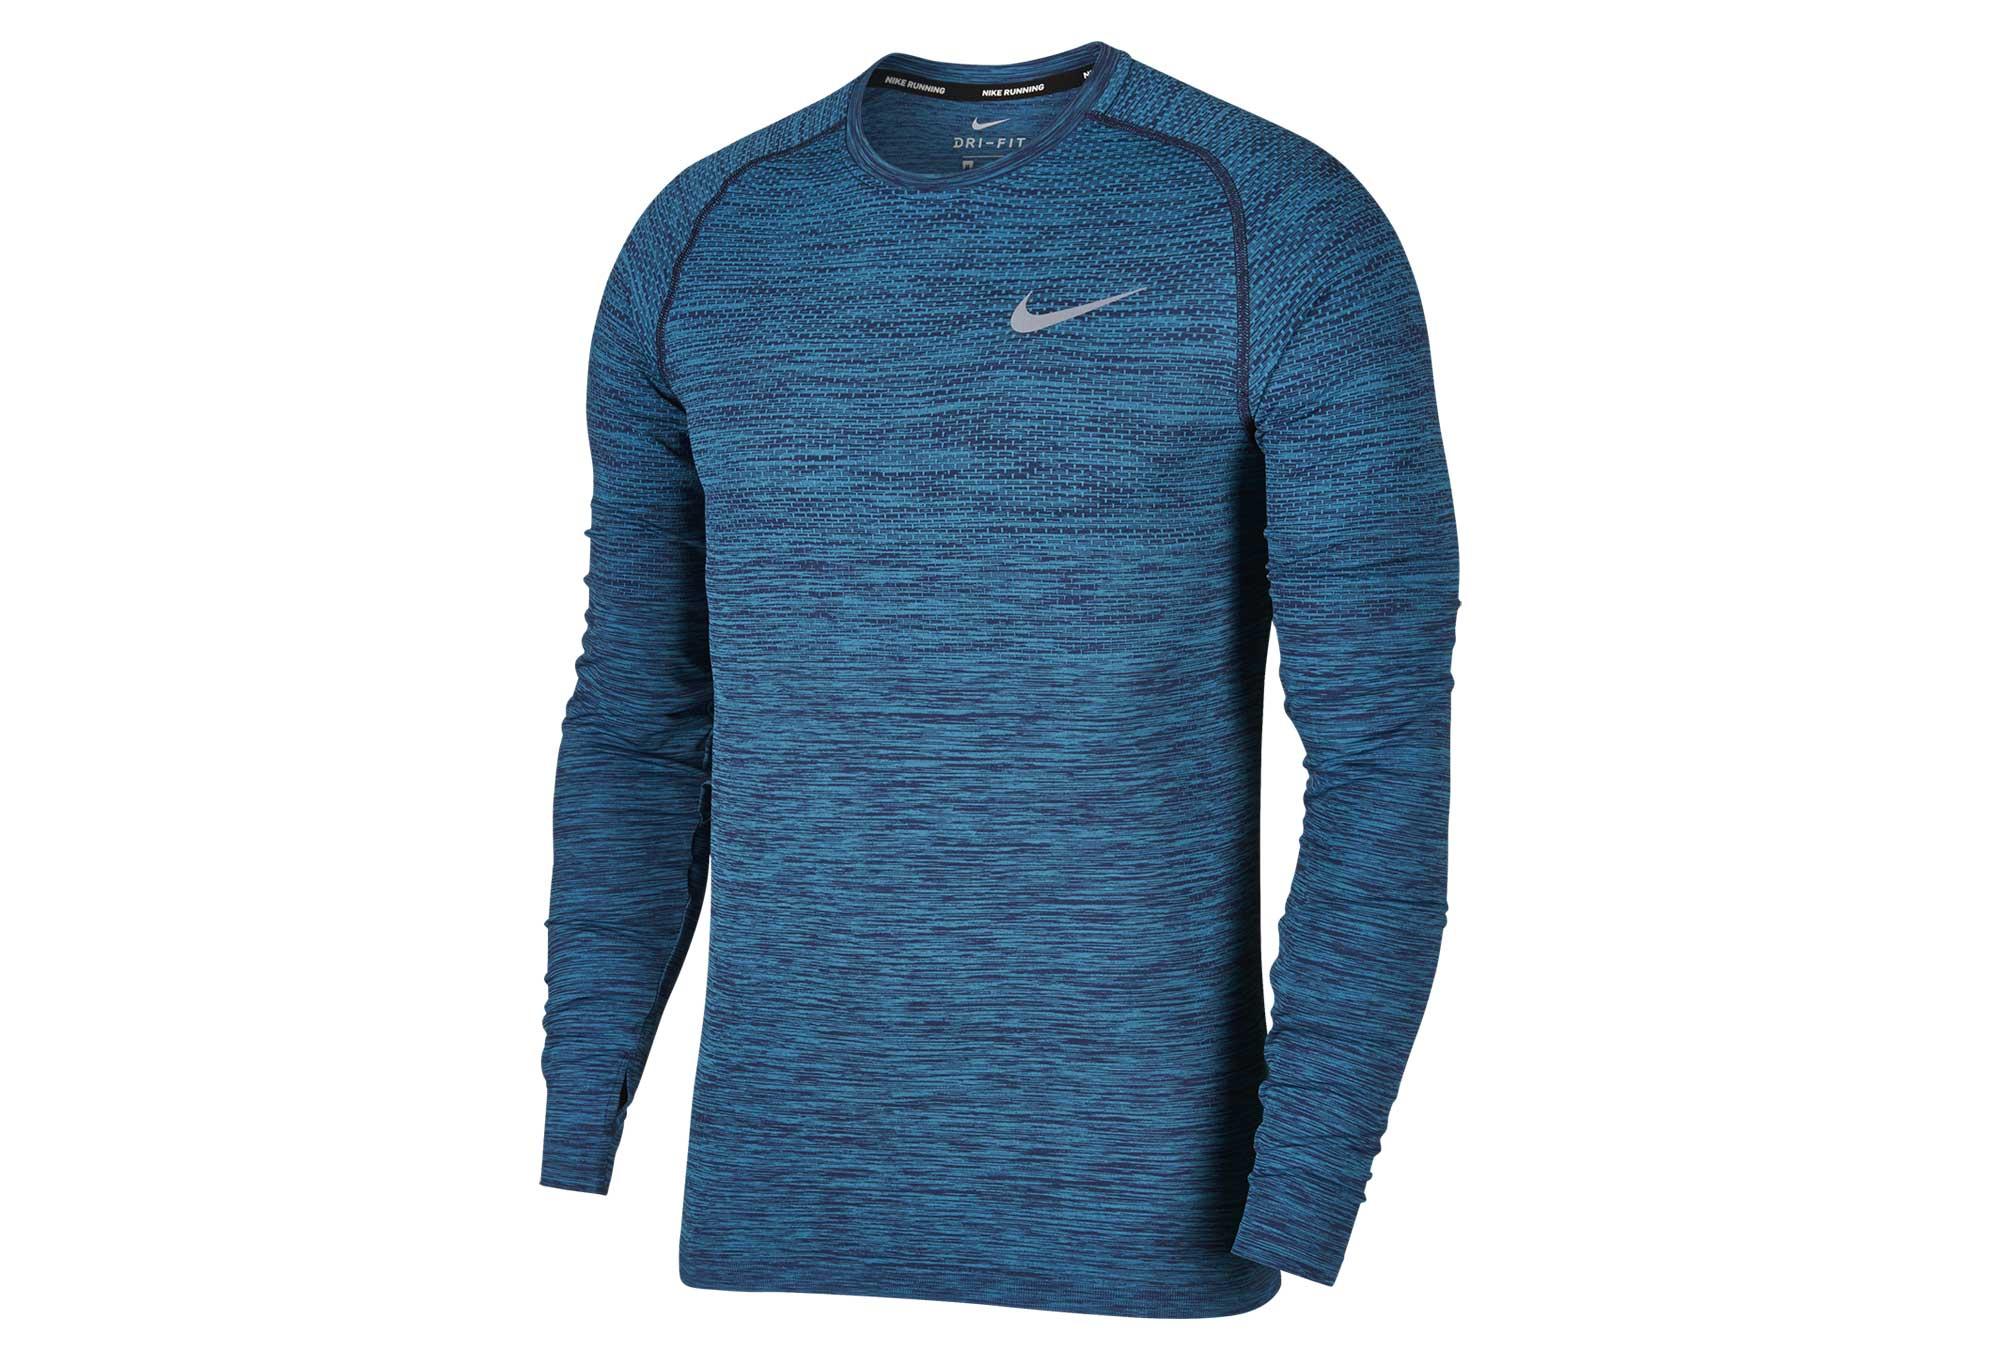 29a6e19c3 Nike Dri-Fit Knit Men's Top Blue | Alltricks.com